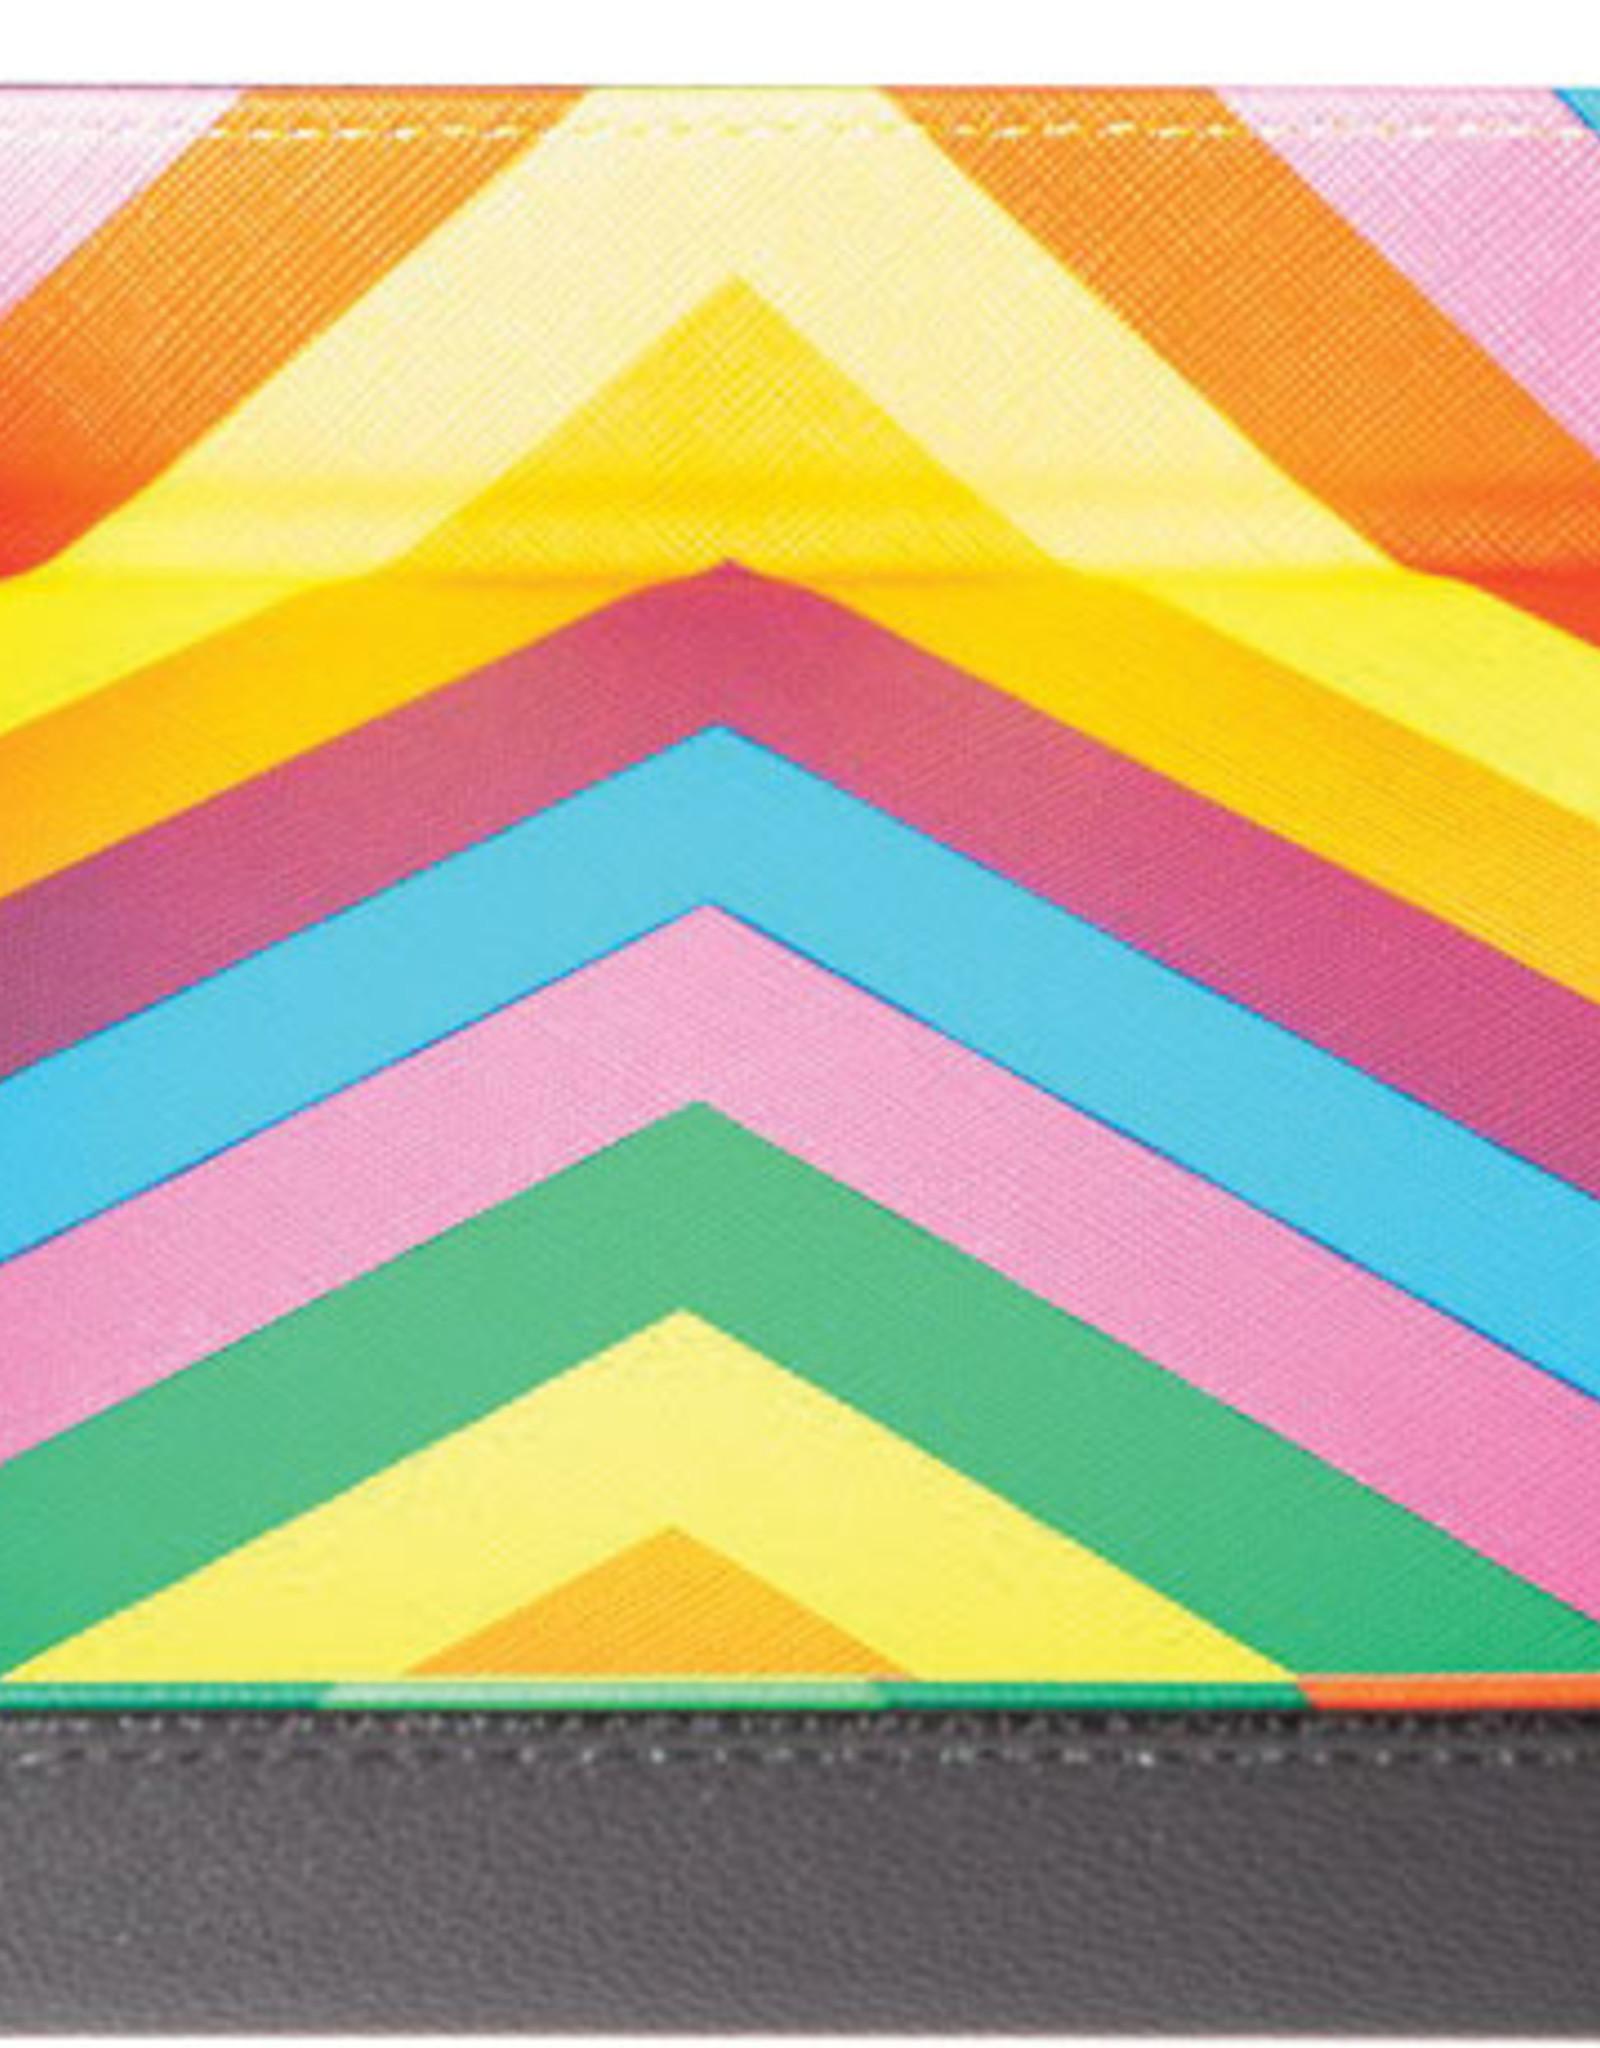 Rainbow Velvet Folding Dice Tray with Leather Backing